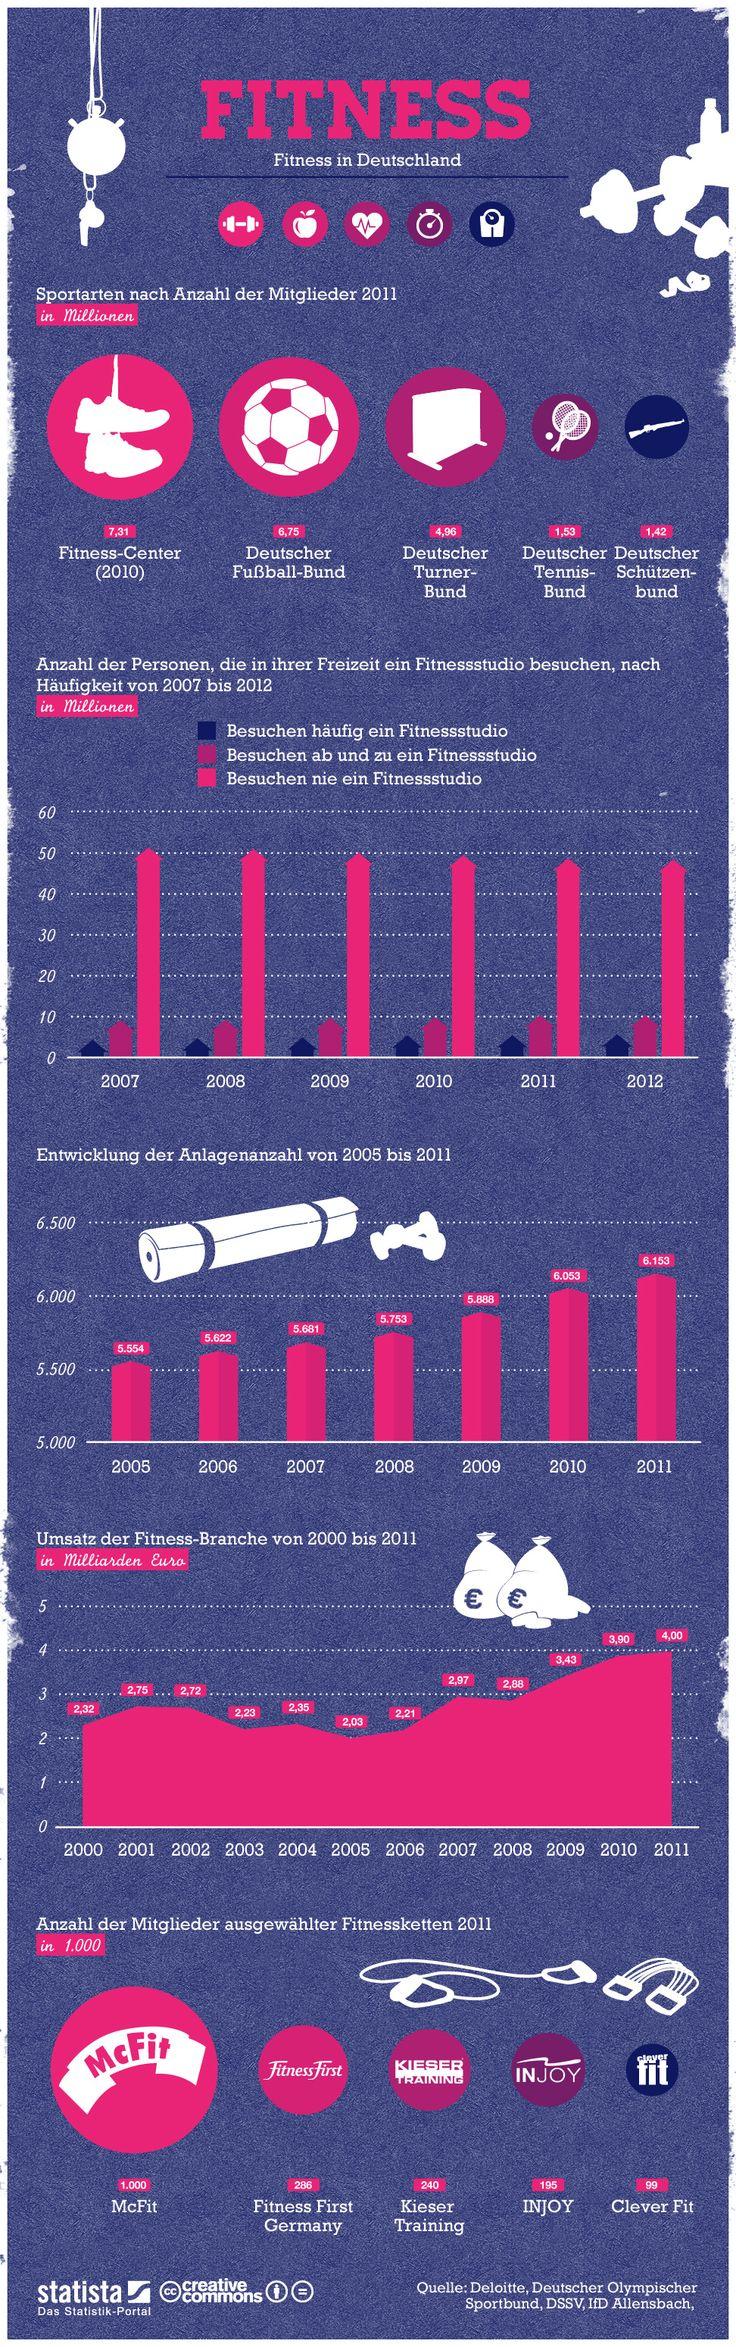 Infografik: Fitness  Daten zum Thema Fitness in Deutschland. #statista #infografik